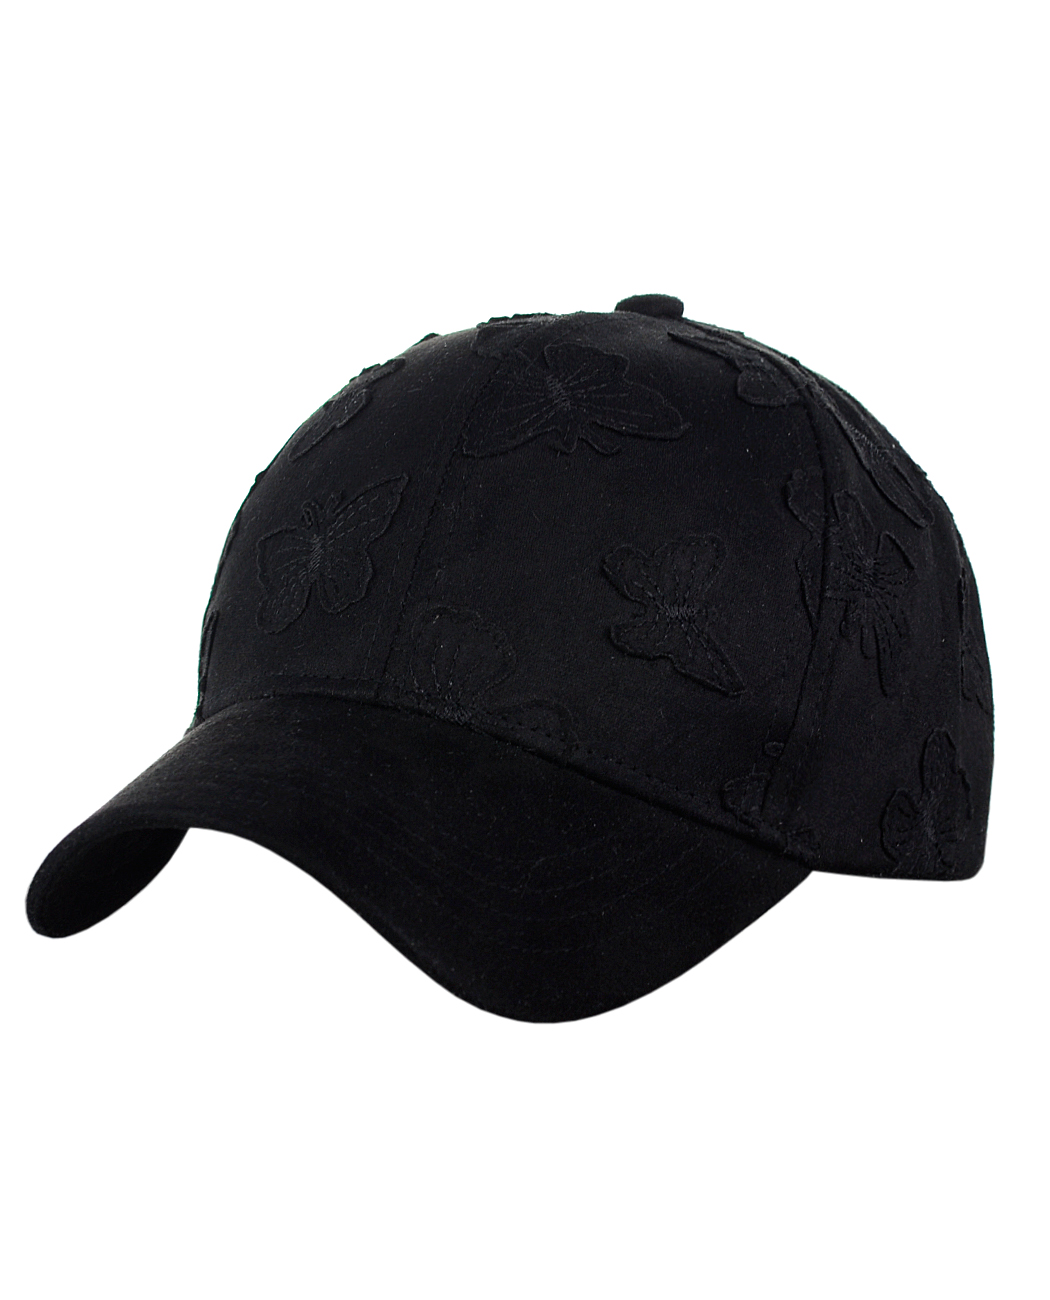 C.C Women's Butterfly Pattern Faux Suede Adjustable Precurved Baseball Cap Hat, Black